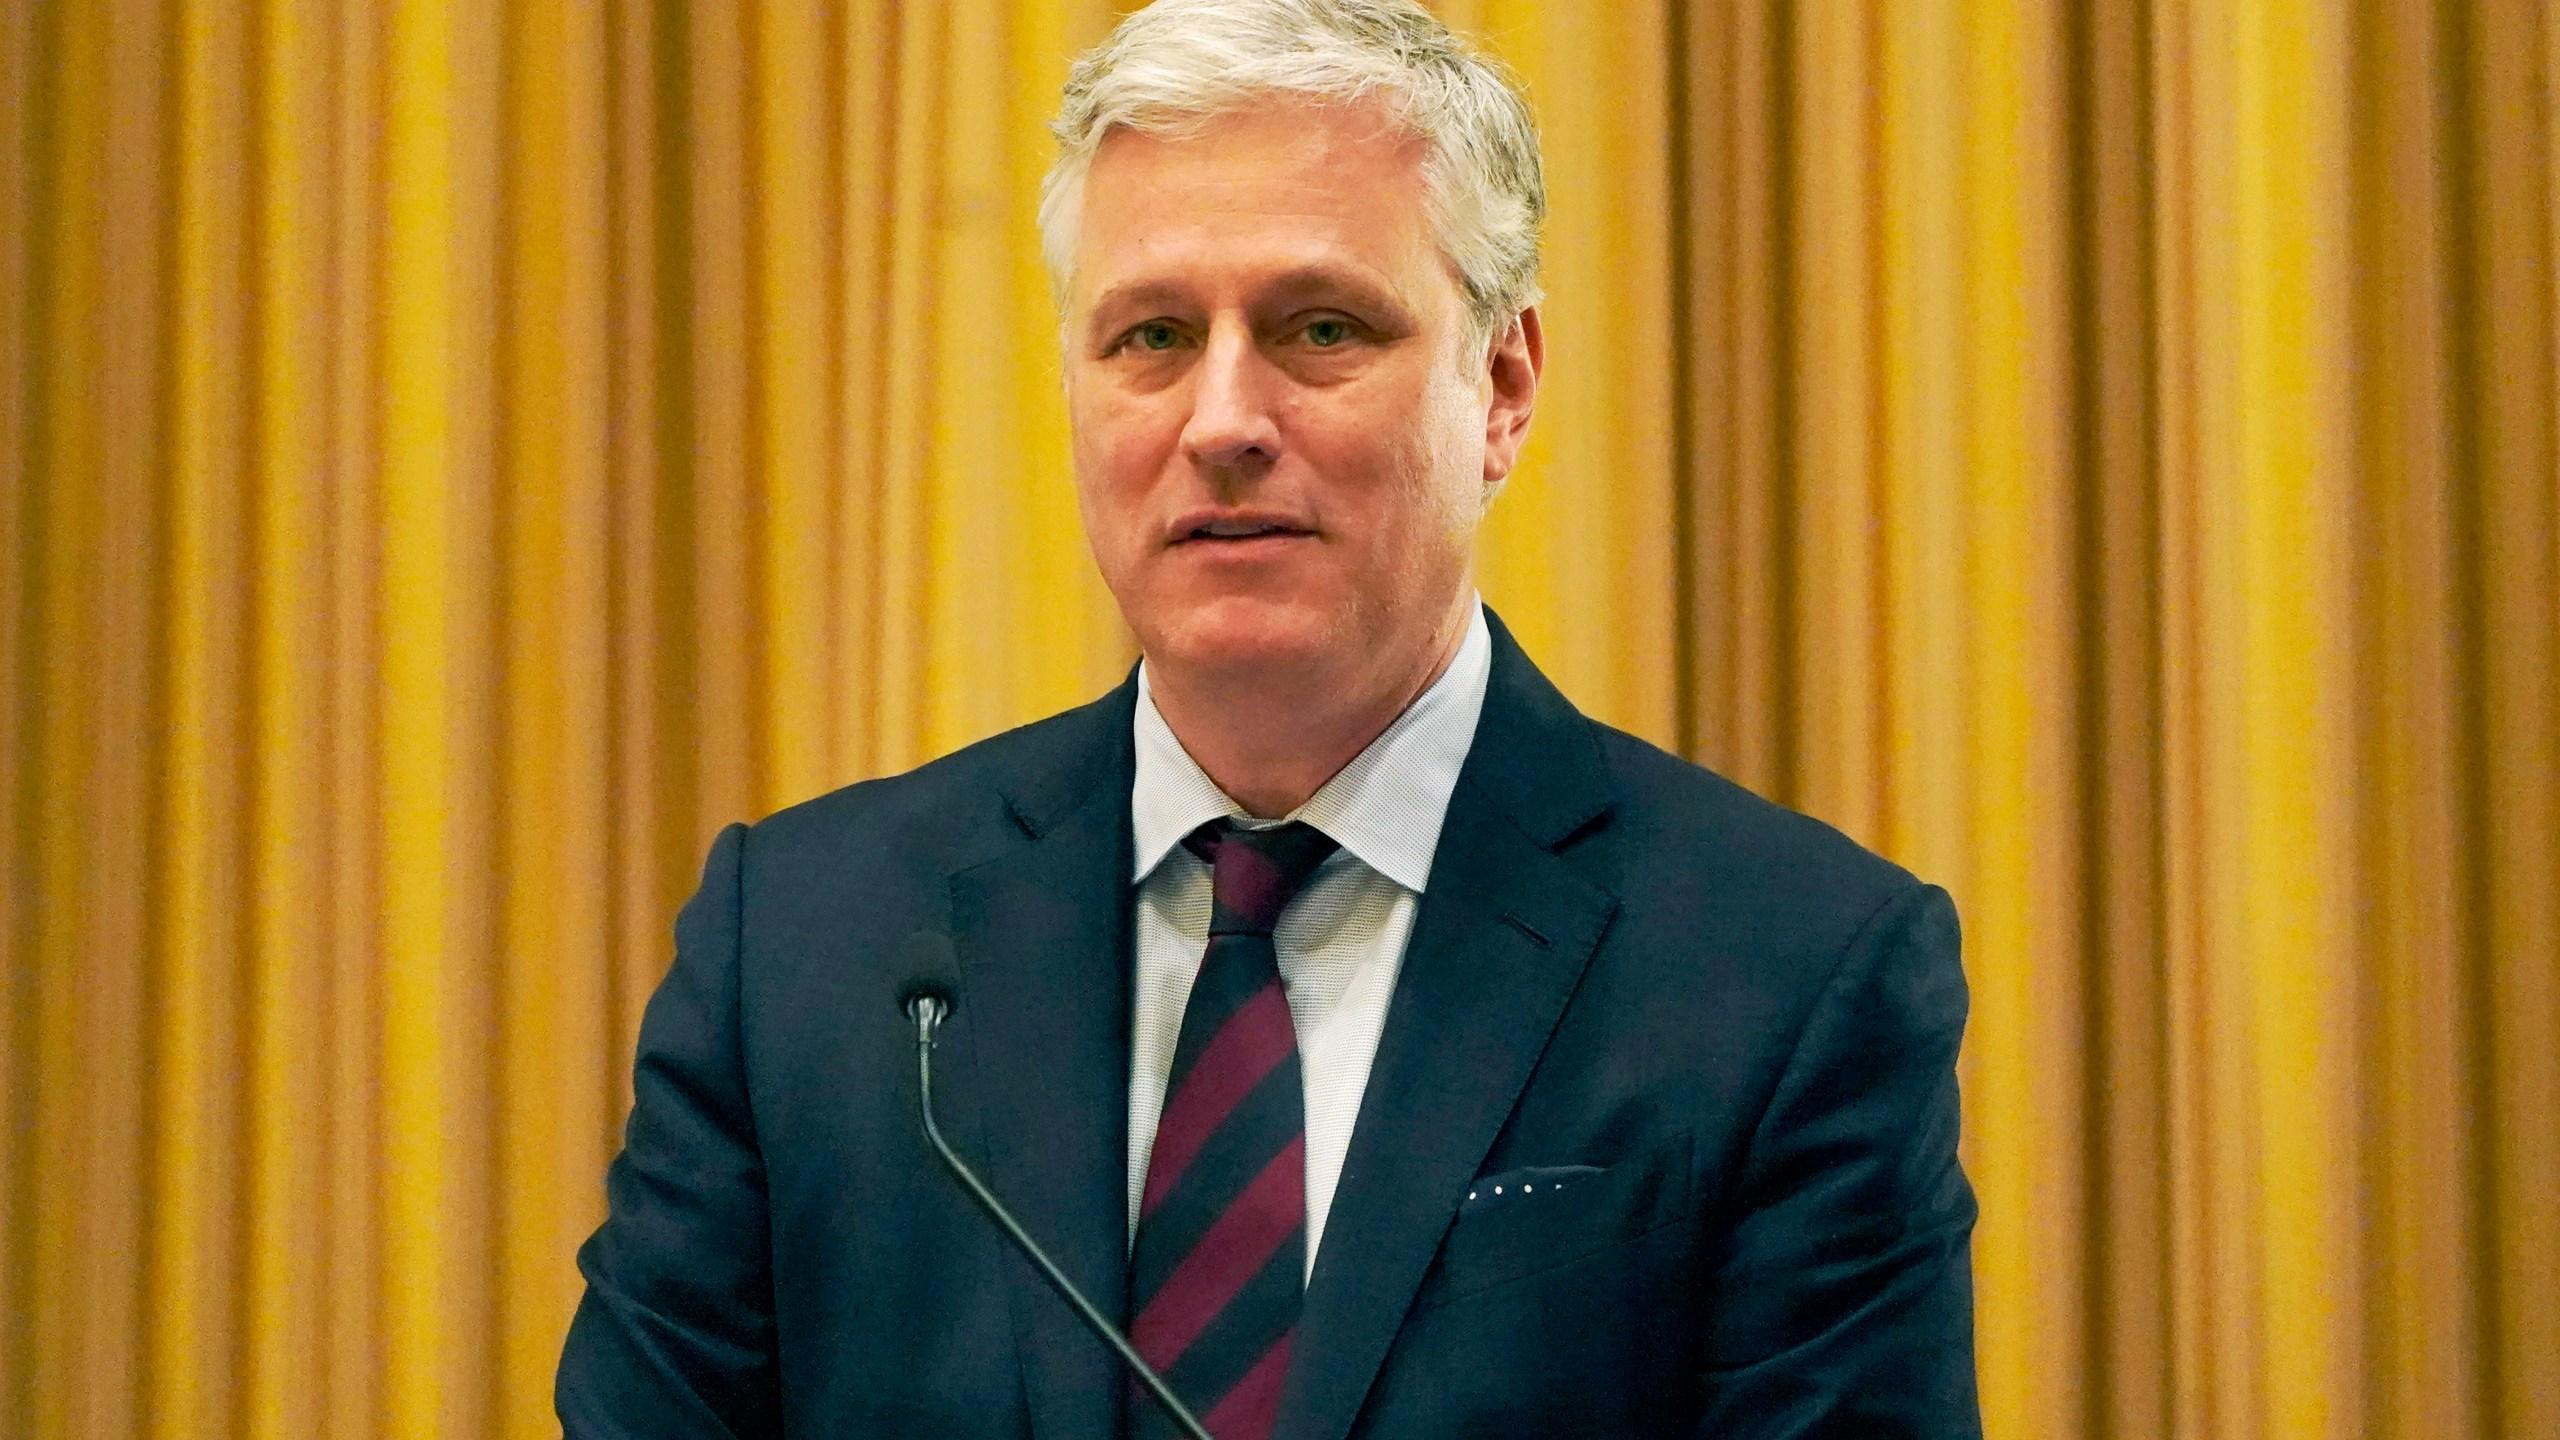 Robert O'Brien